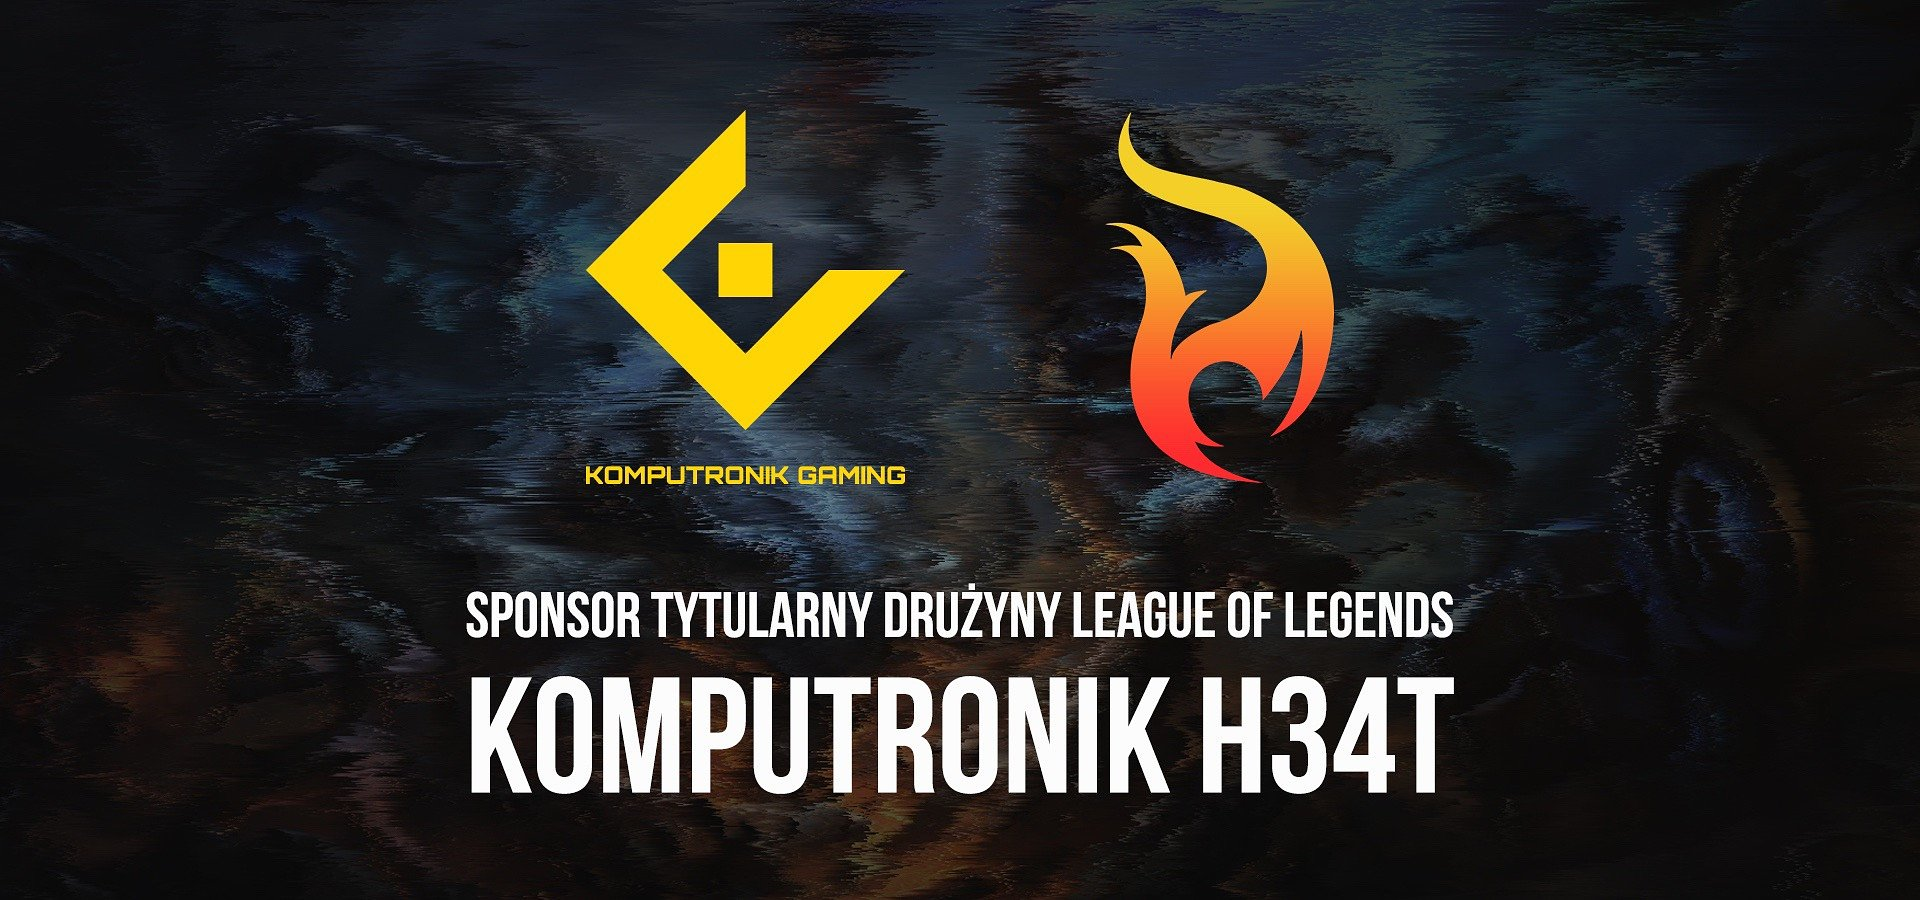 Komputronik Gaming sponsorem tytularnym H34T